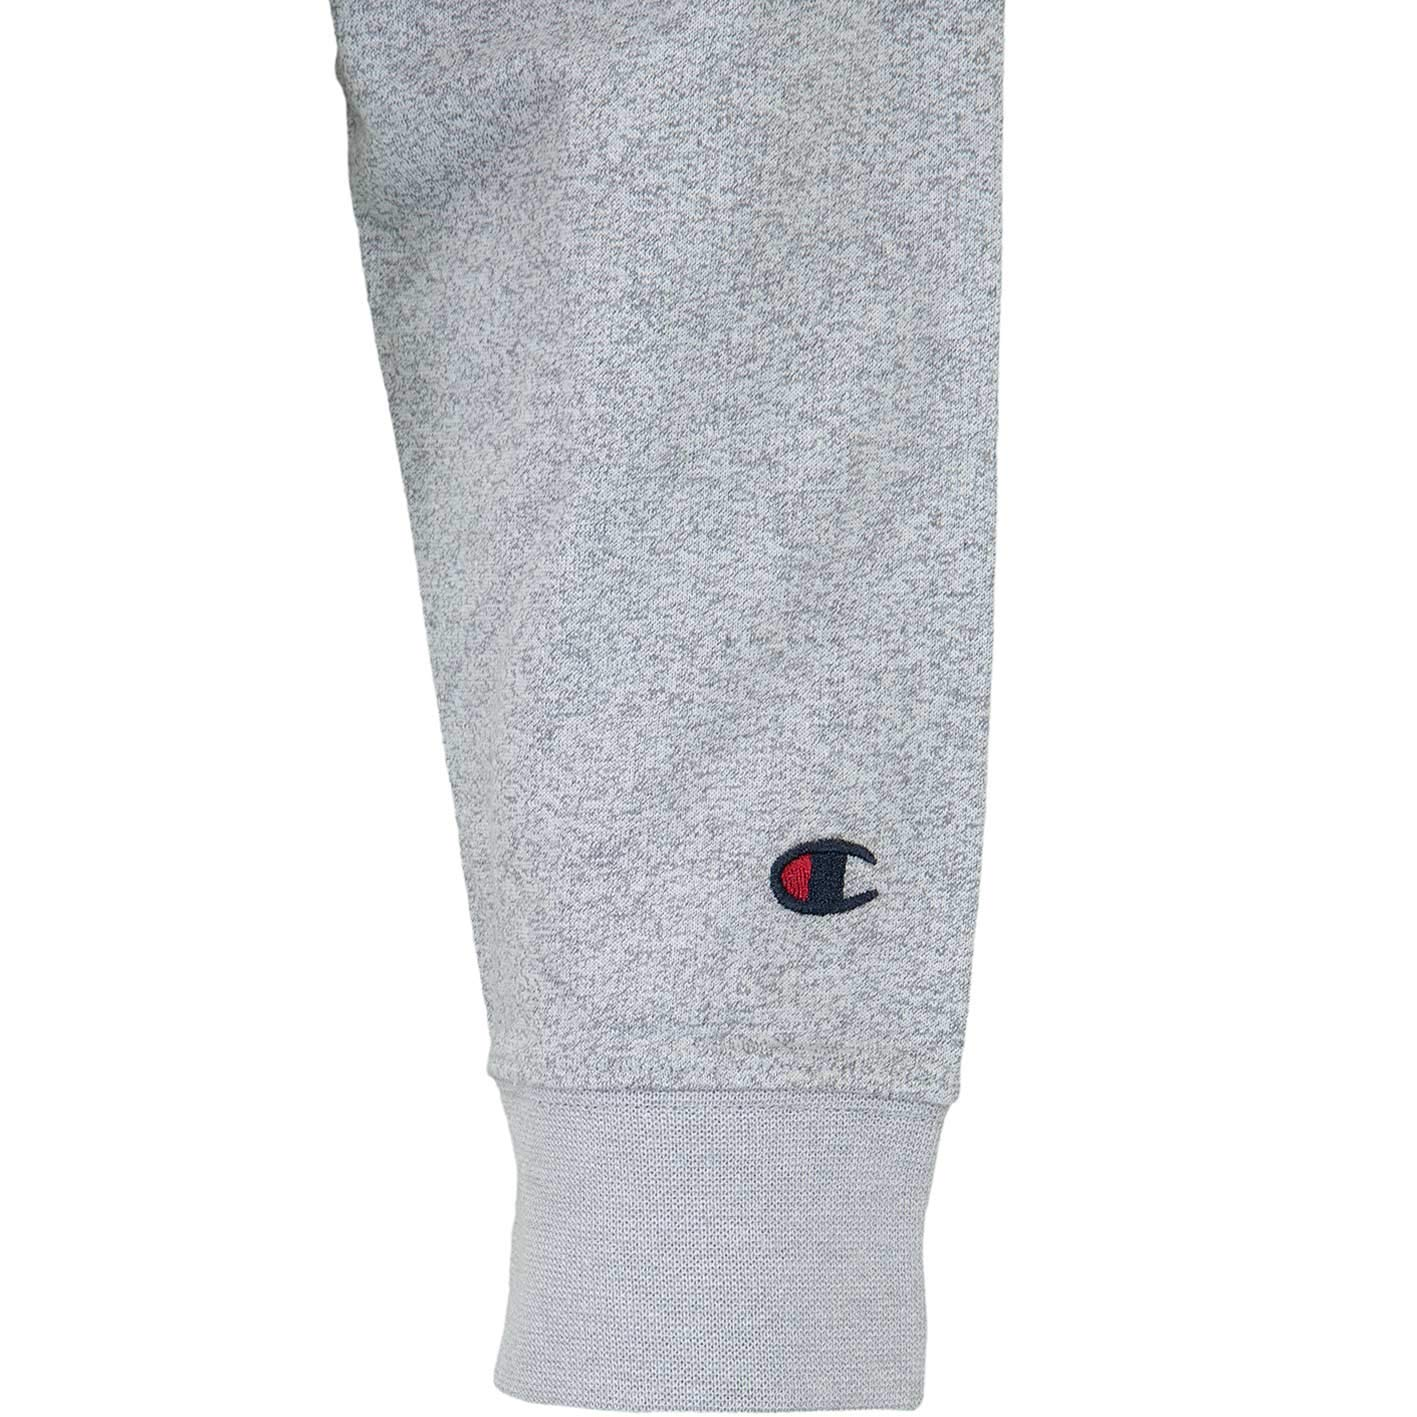 Champion Logo damen Crewneck Sweatshirt B07MZX7KDT Sweatshirts Sweatshirts Sweatshirts Mode-Muster 73b3be